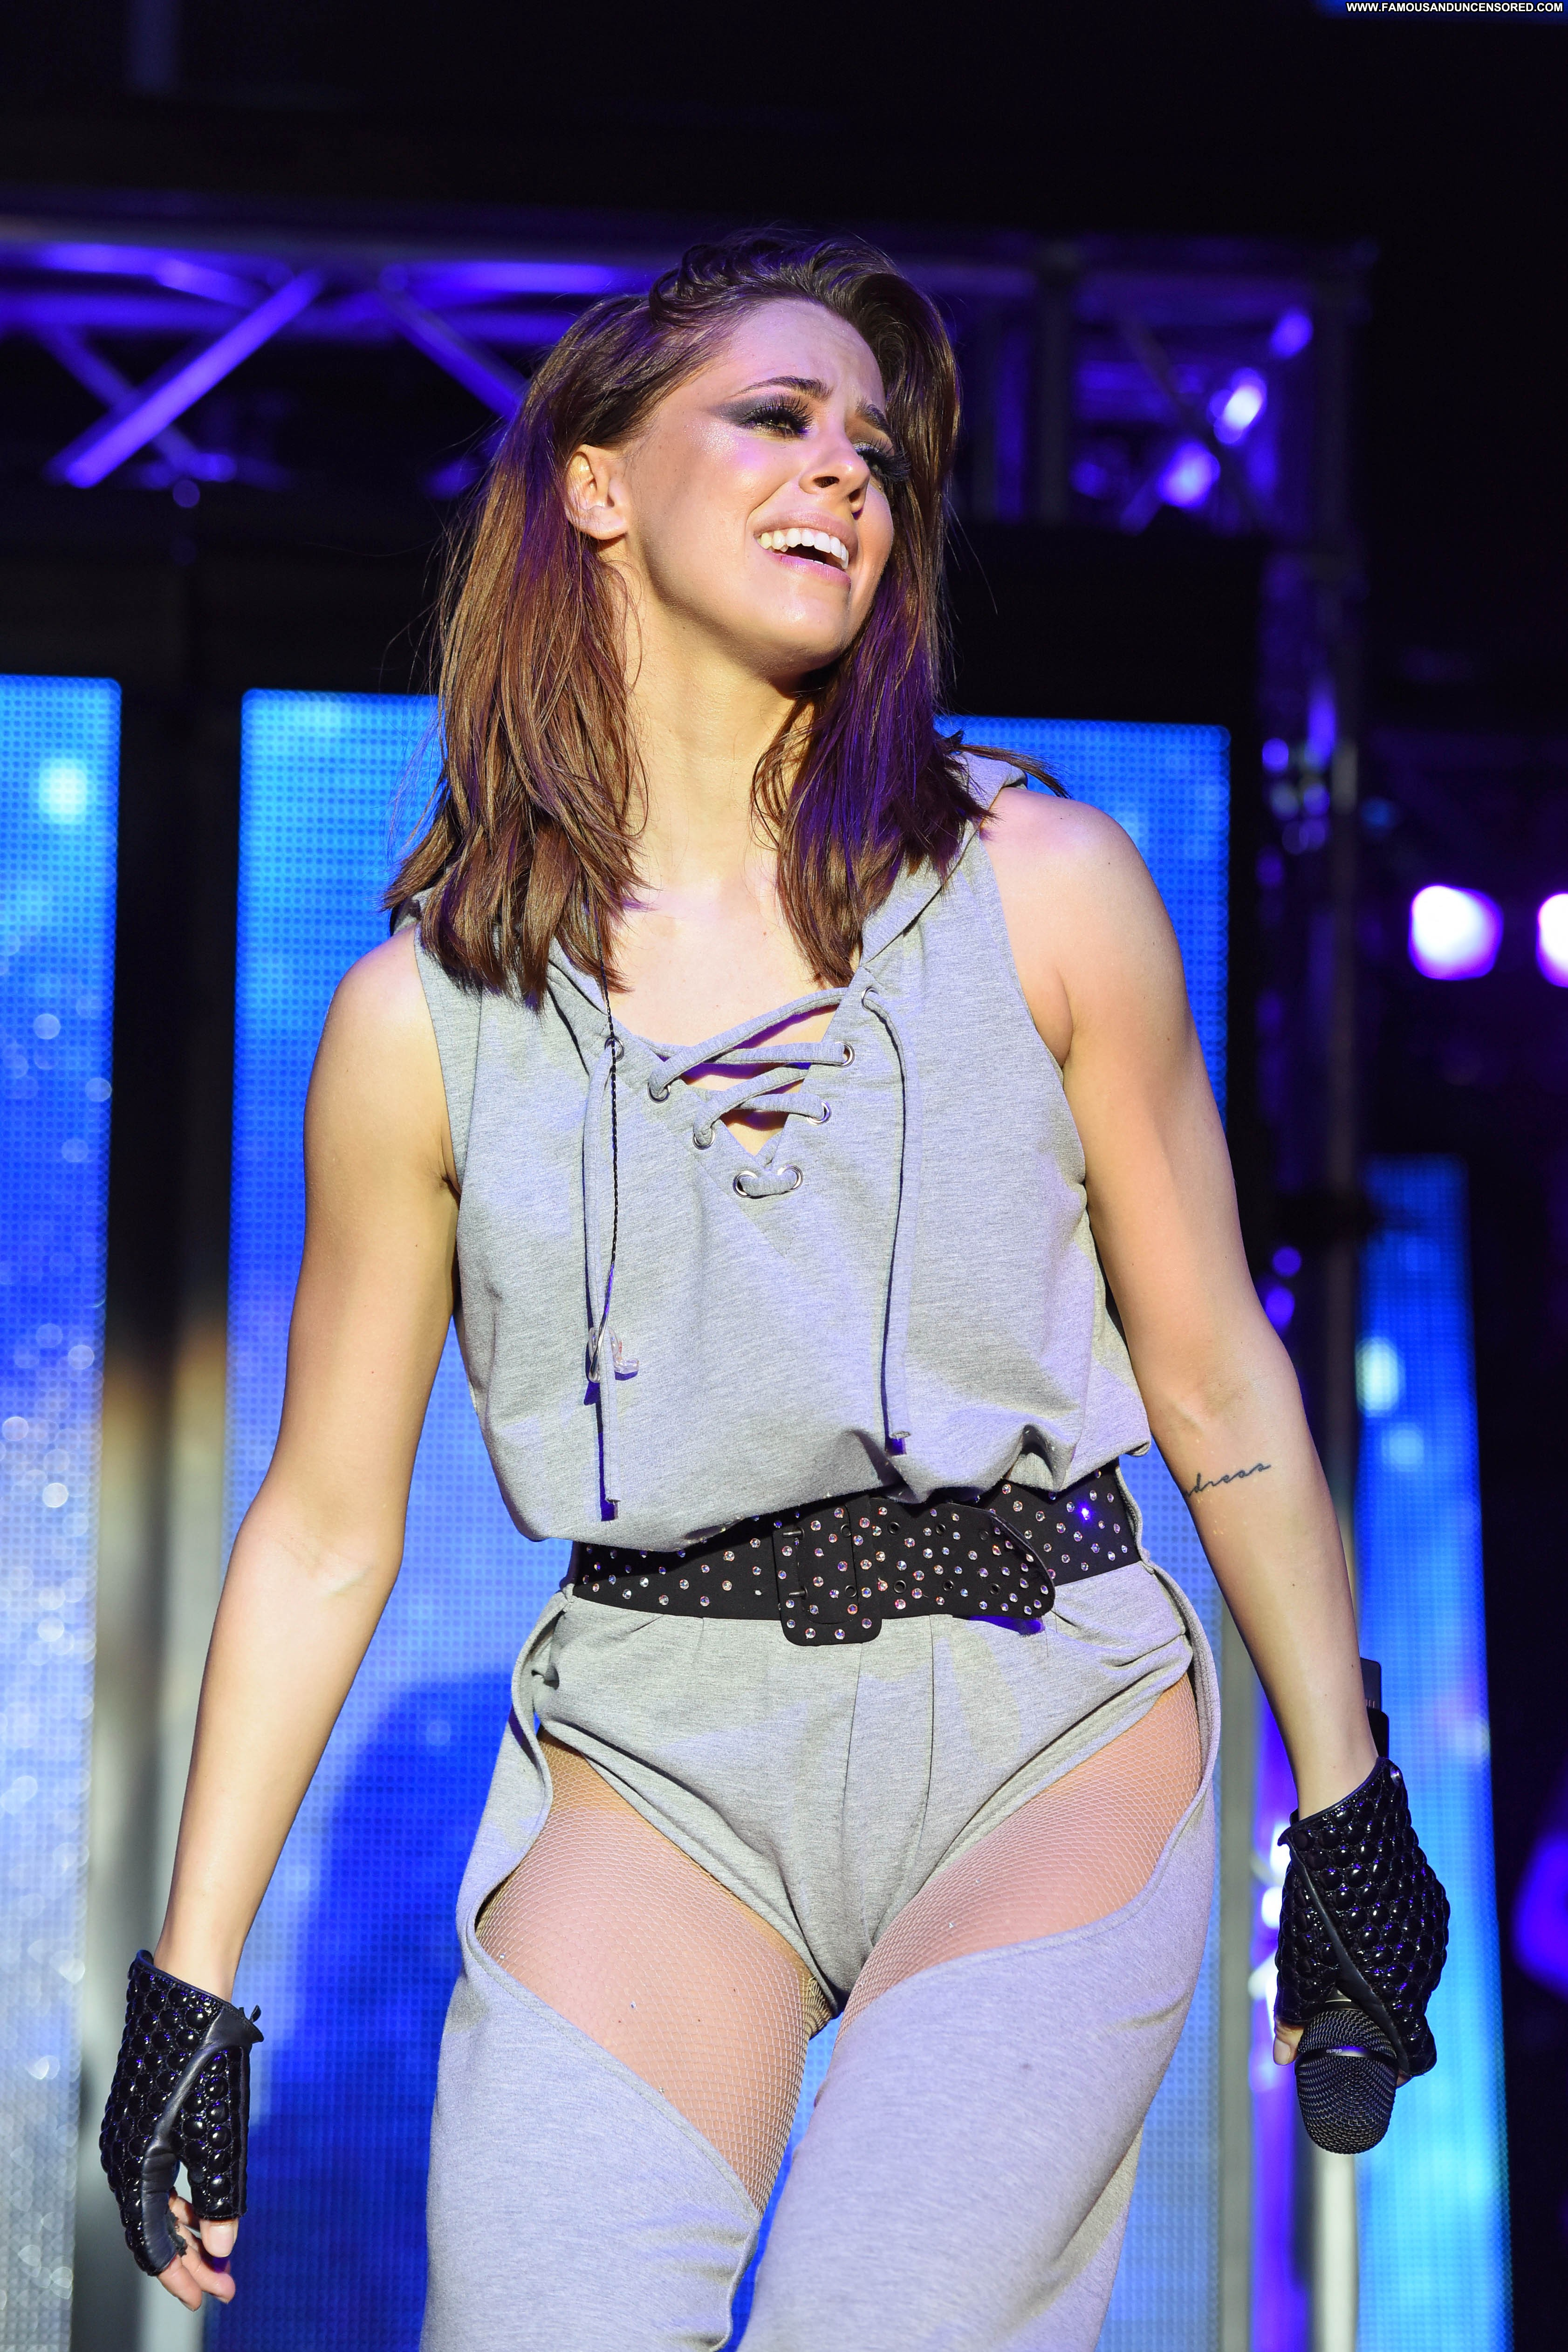 Vanessa Mai No Source Celebrity Beautiful Babe Posing Hot Live